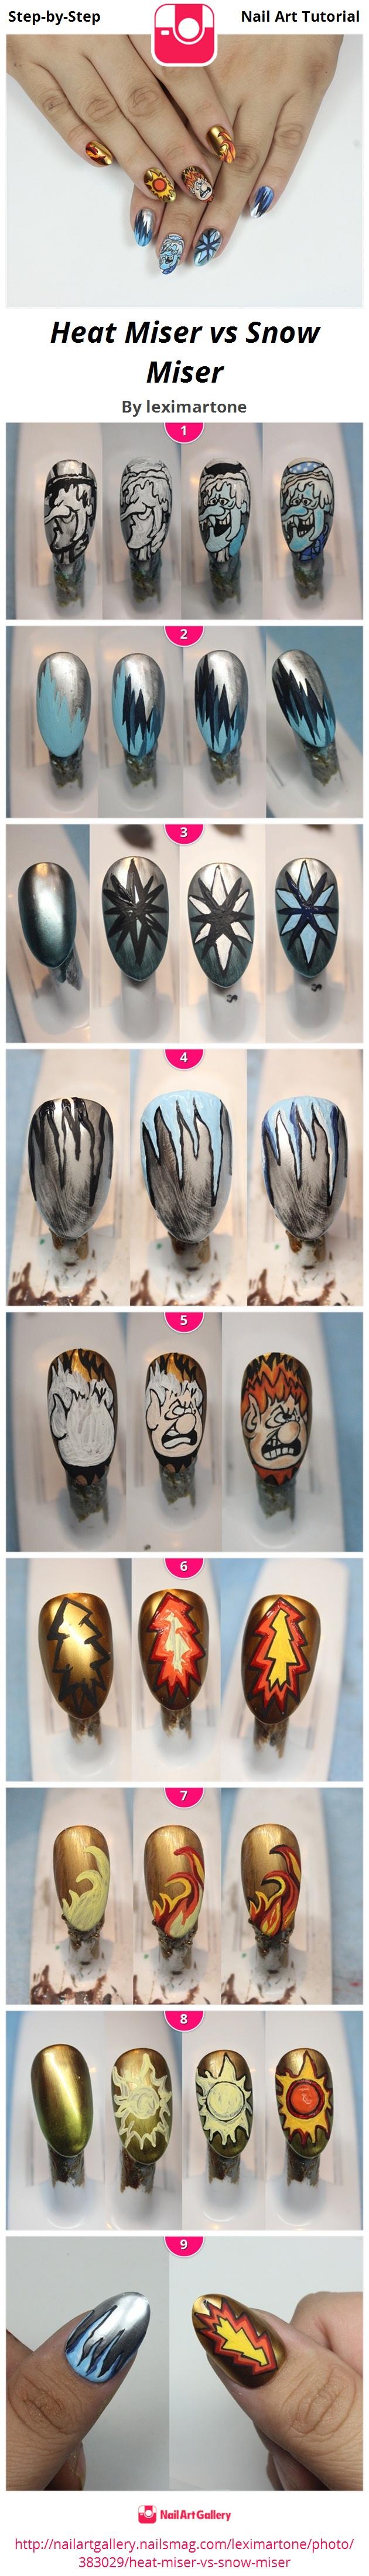 Heat Miser vs Snow Miser - Nail Art Gallery